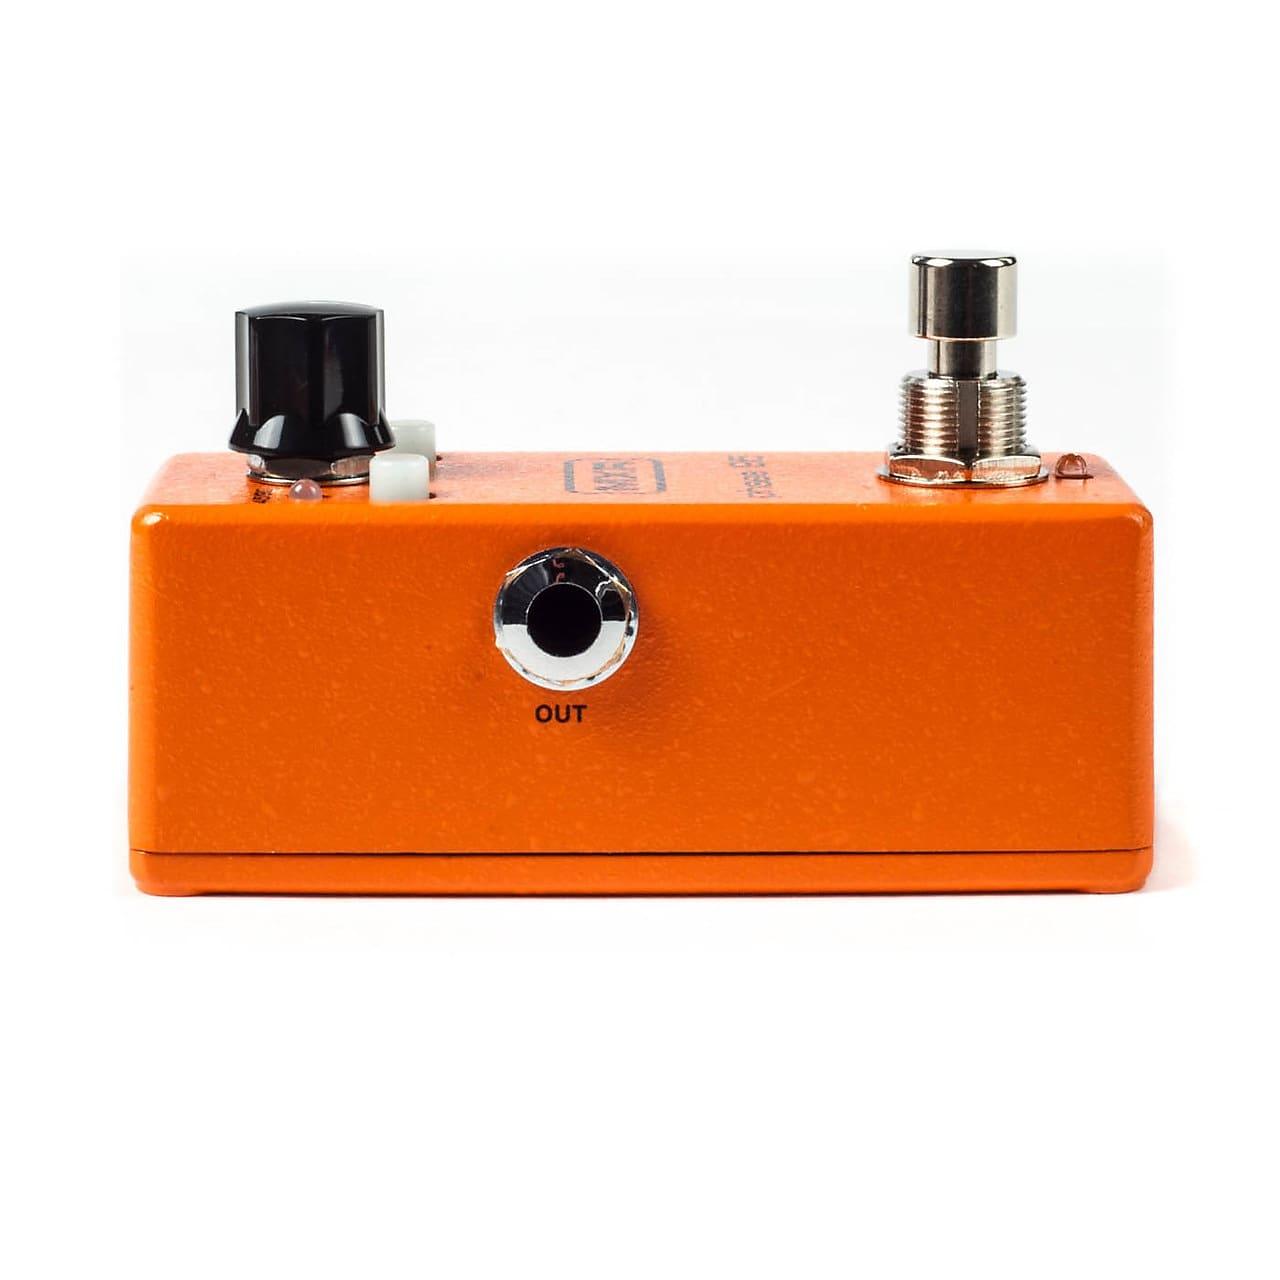 MXR M290 Phase 95 Mini Phaser Effects Pedal